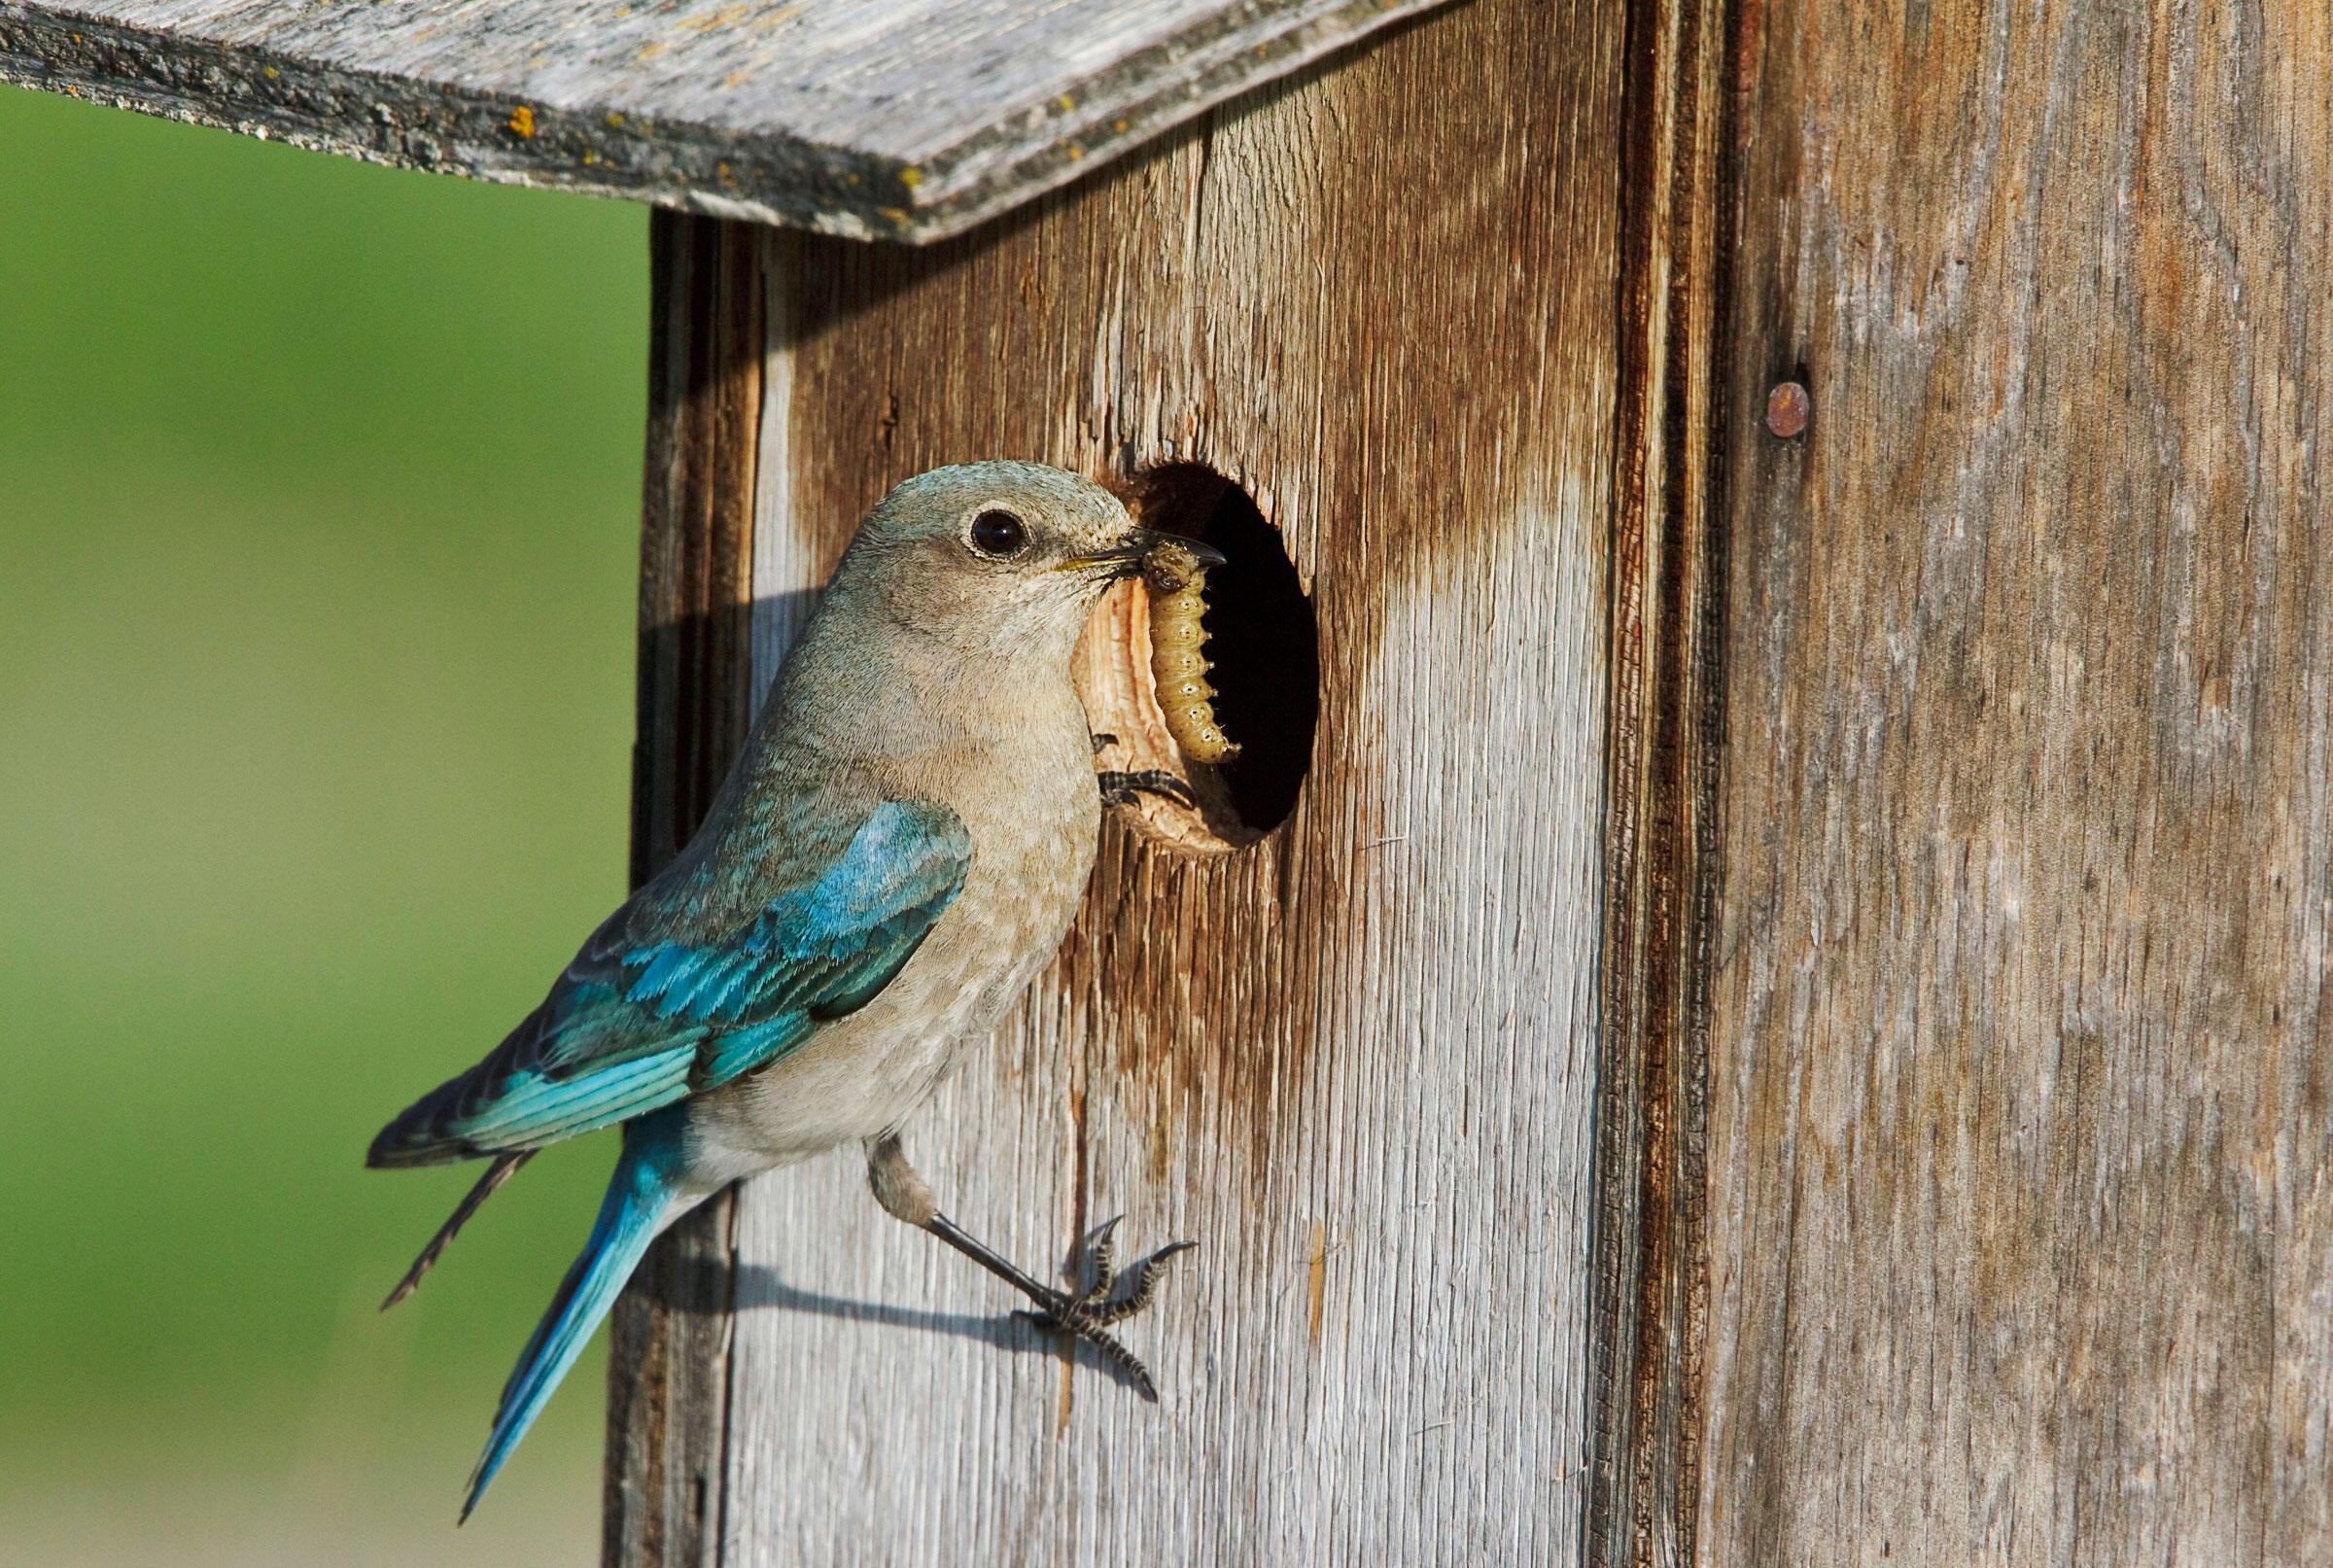 Adult female Mountain Bluebird. Glenn Bartley/BIA/Minden Pictures/Corbis